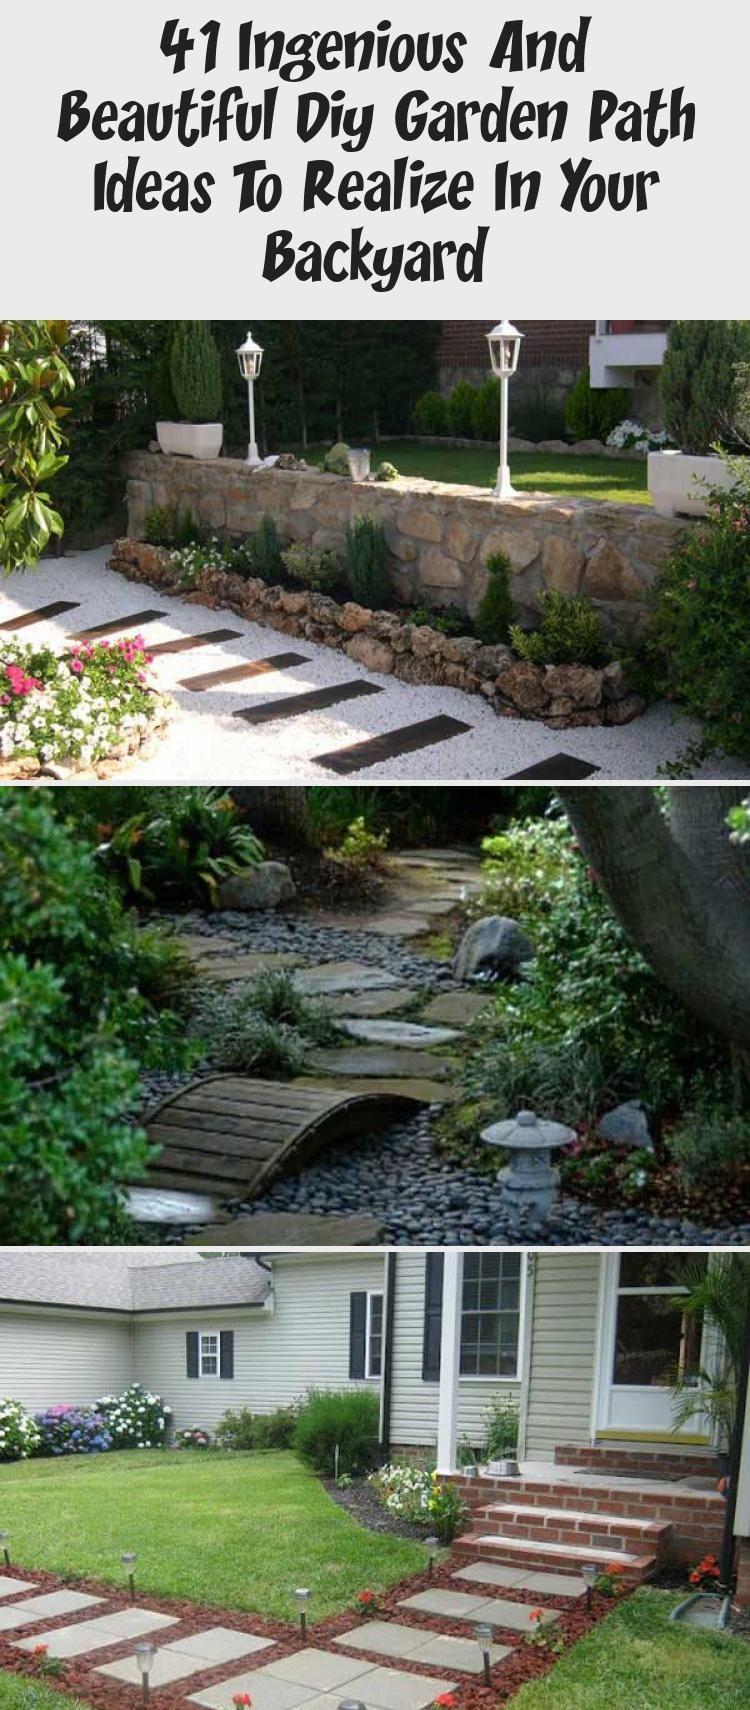 Photo of 41 Ingenious And Beautiful Diy Garden Path Ideas To Realize In Your Backyard – Backyard İdeas